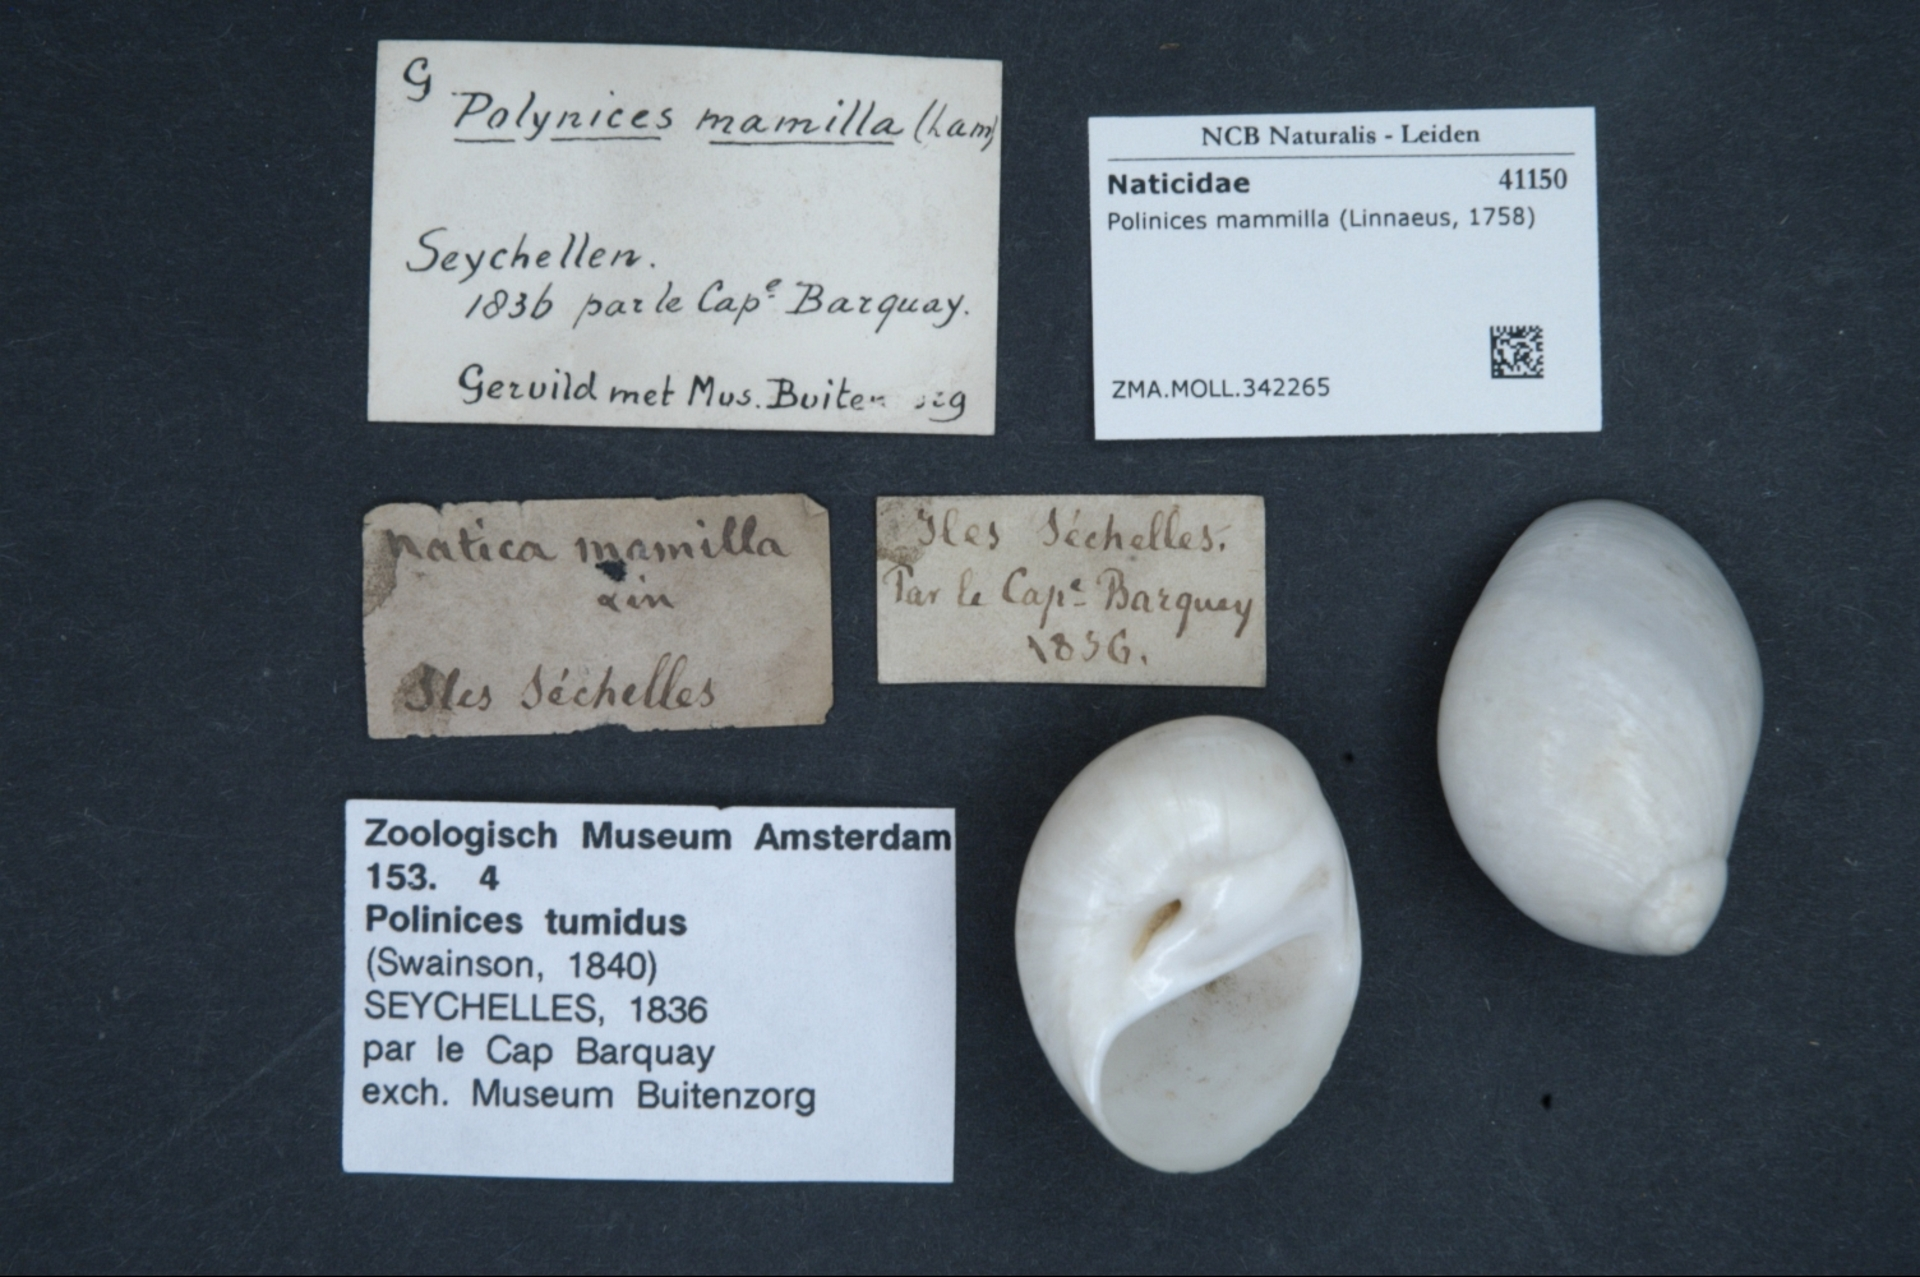 ZMA.MOLL.342265 | Polinices mammilla (Linnaeus, 1758)